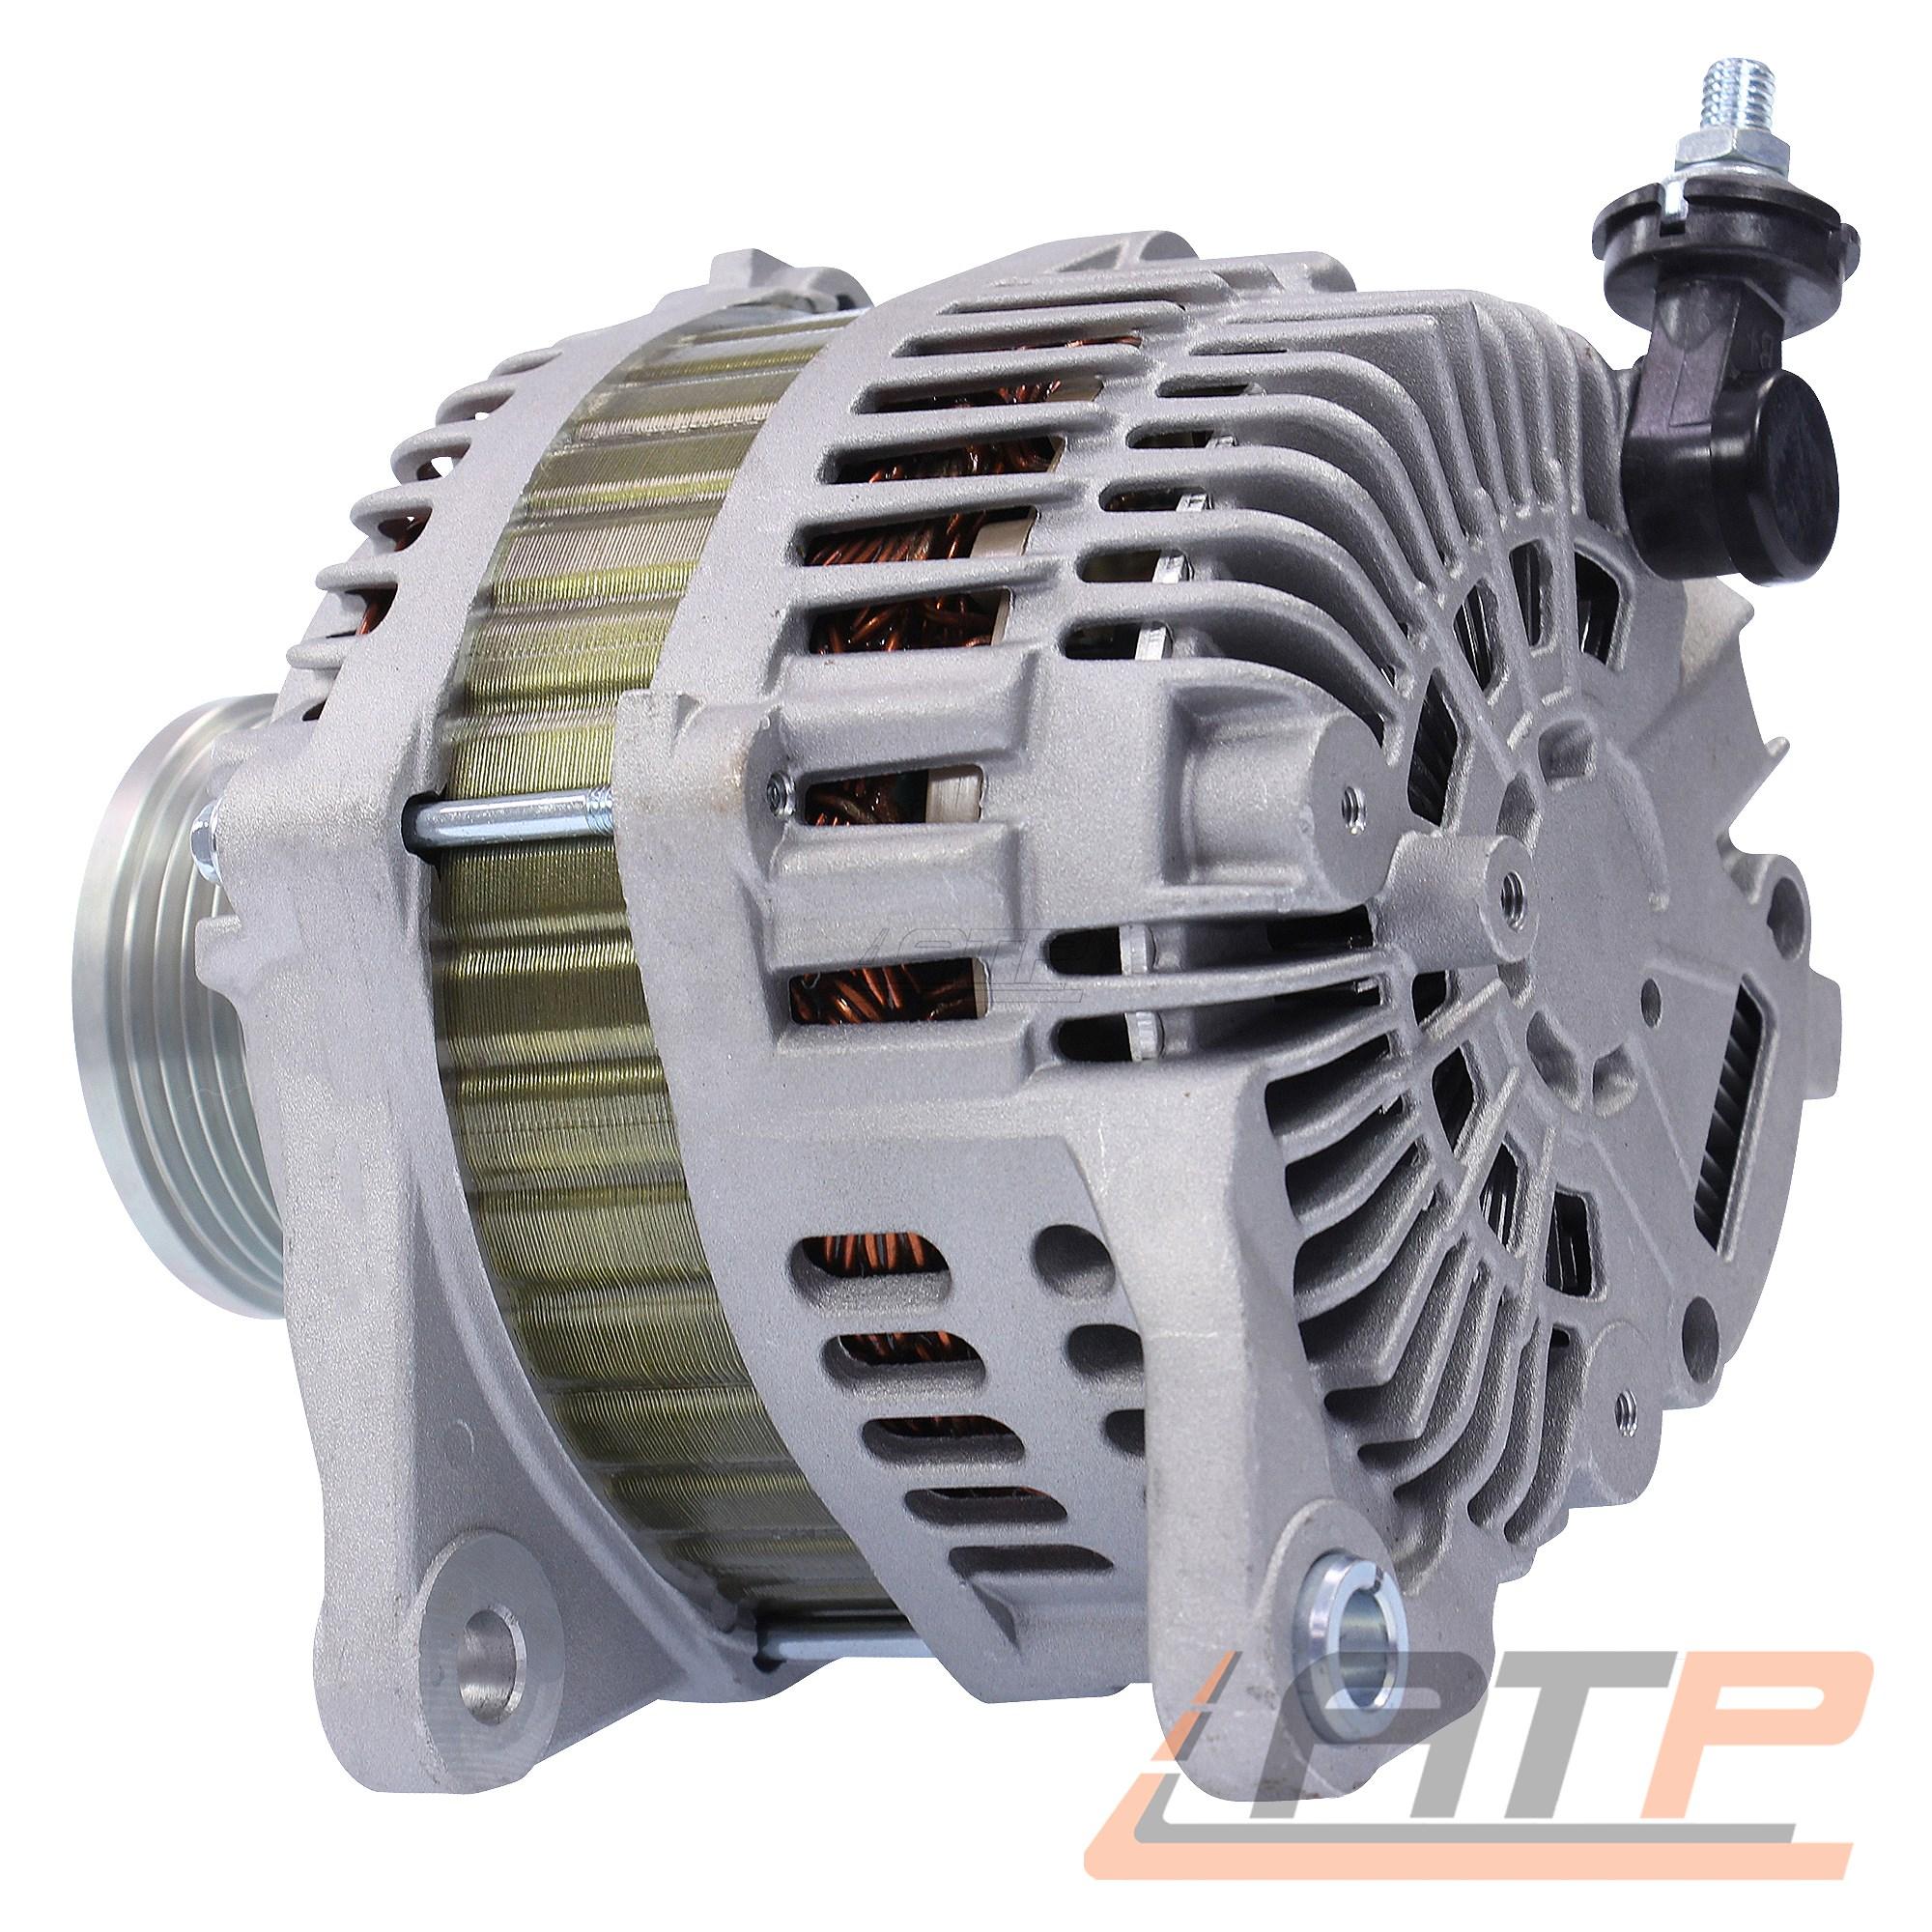 La dínamo generador 150-a para nissan Navara 2.5 DCI BJ a partir de 05